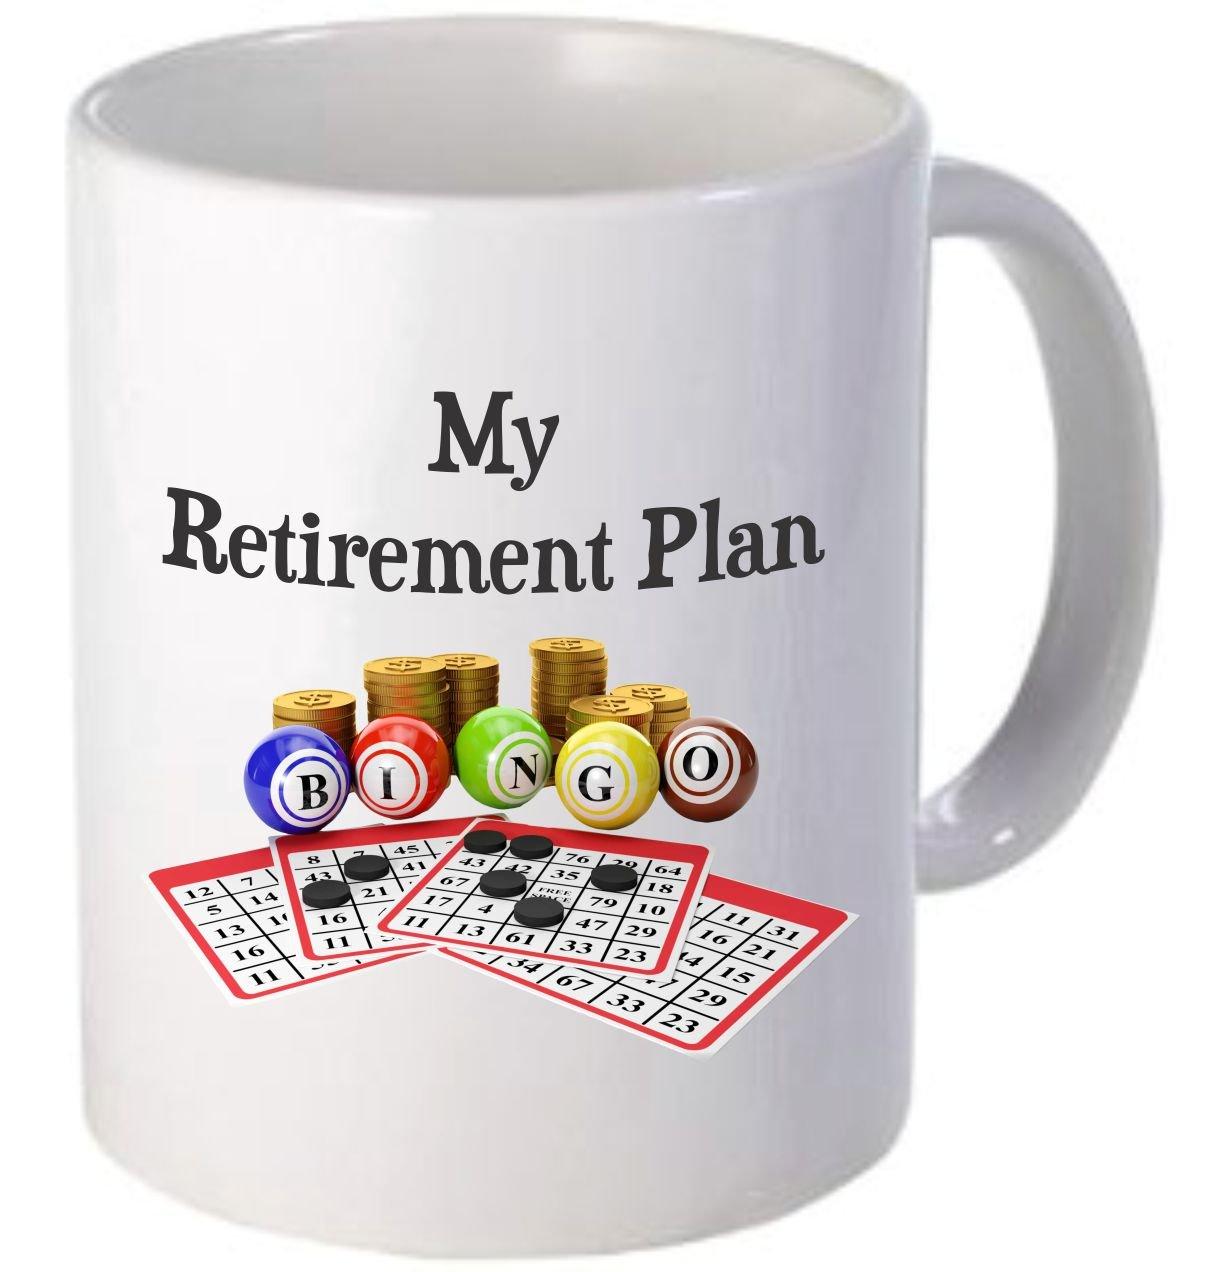 Rikki Knight ''My Retirement Plan Is Bingo'' Funny Quotes Design Ceramic Coffee Mug Cups, 11 oz, White by Rikki Knight